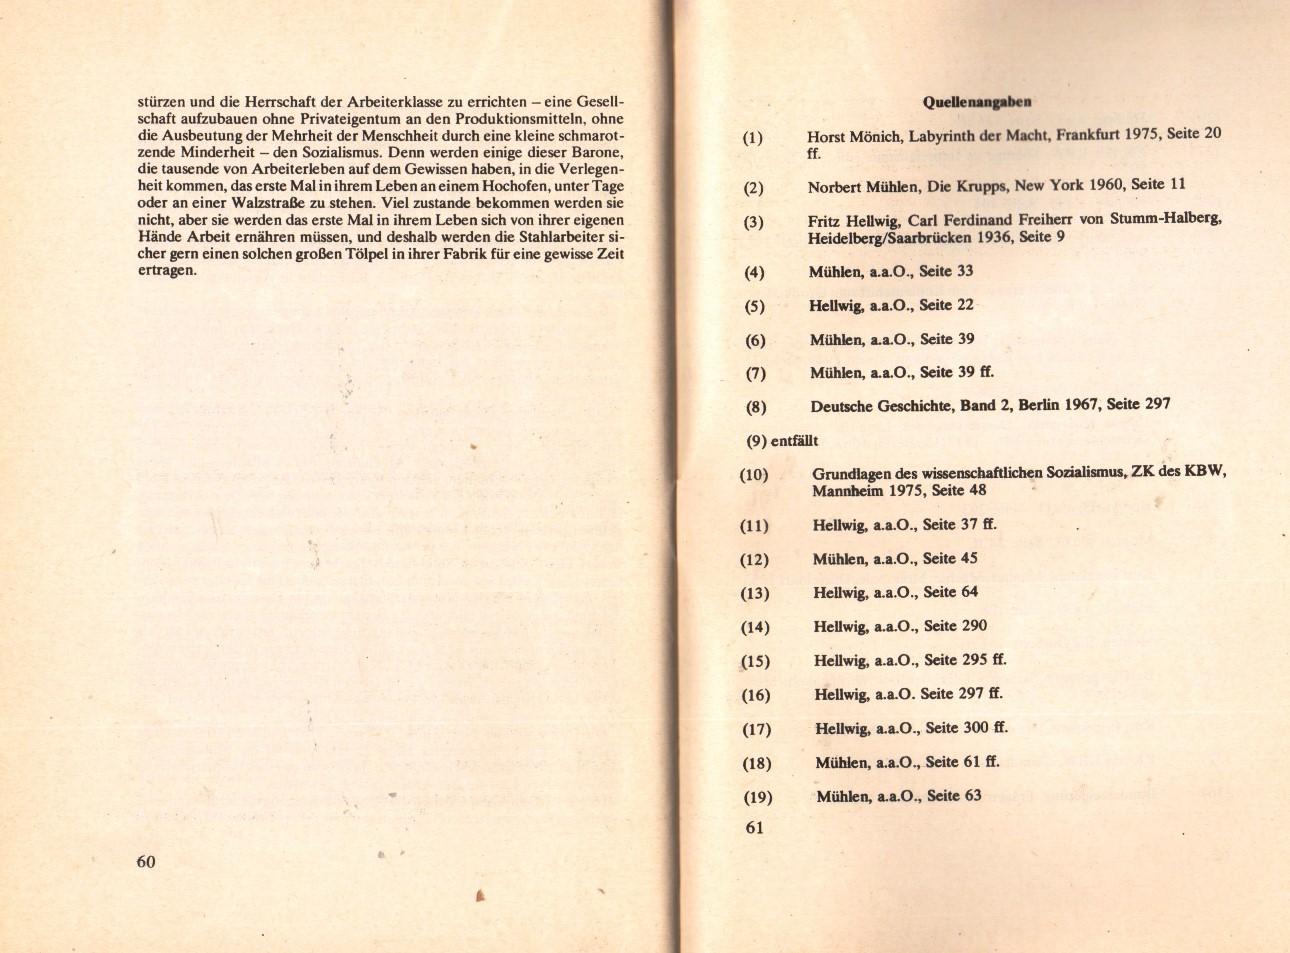 NRW_KBW_1977_Politik_der_Kohle_u_Stahlbarone_32